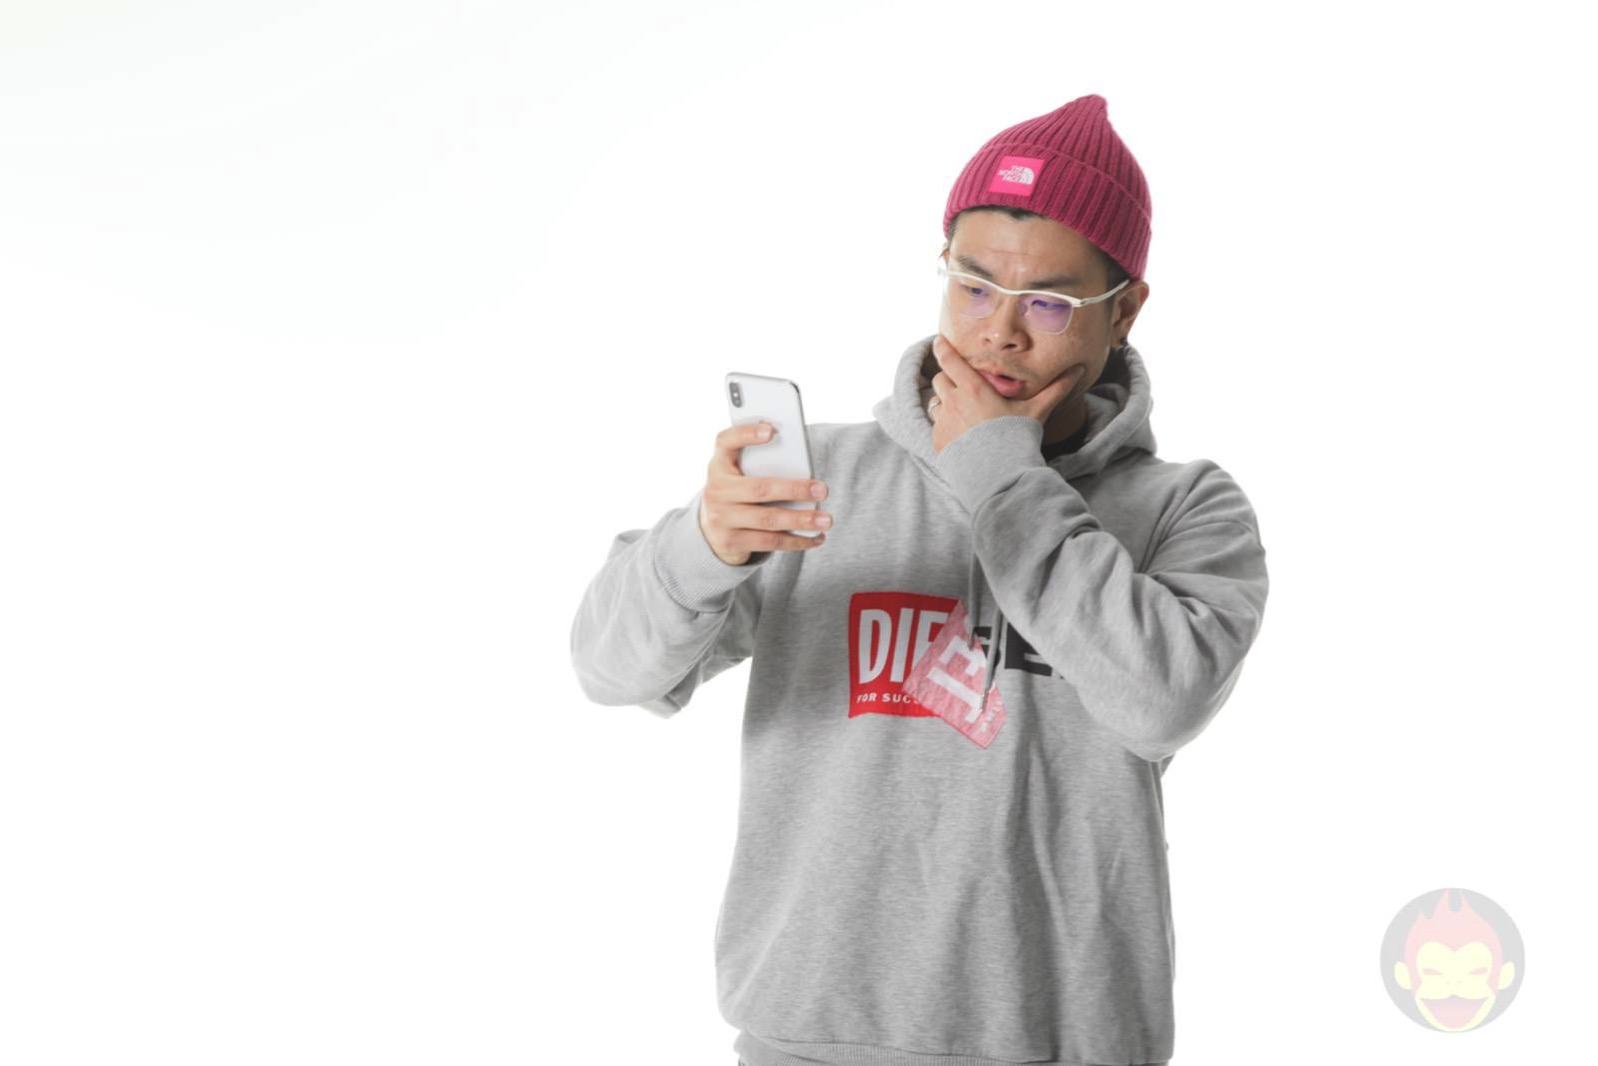 Checking my iPhone GoriMe 01